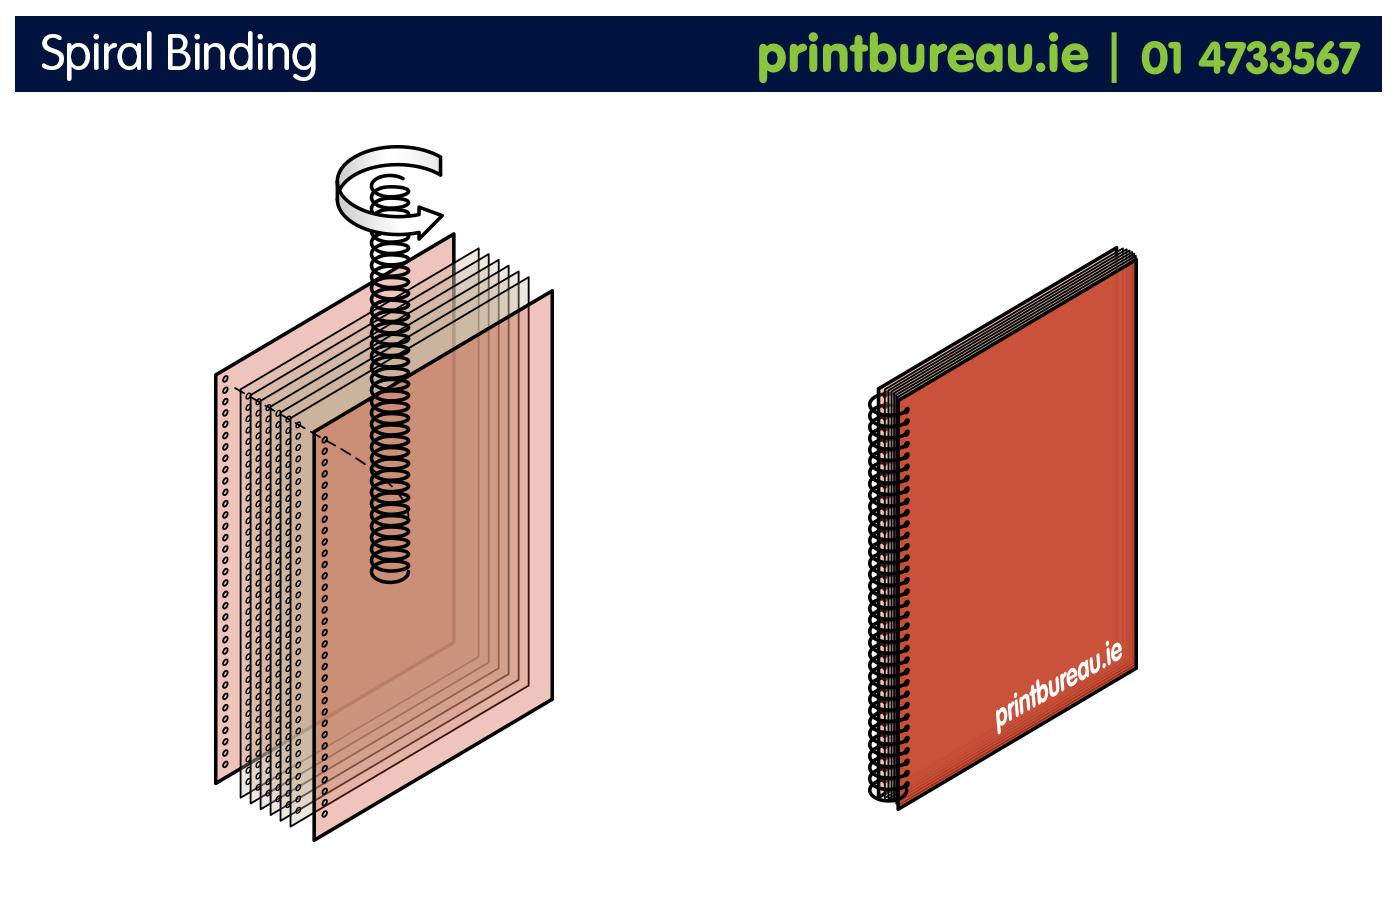 Print Bureau Spiral Binding